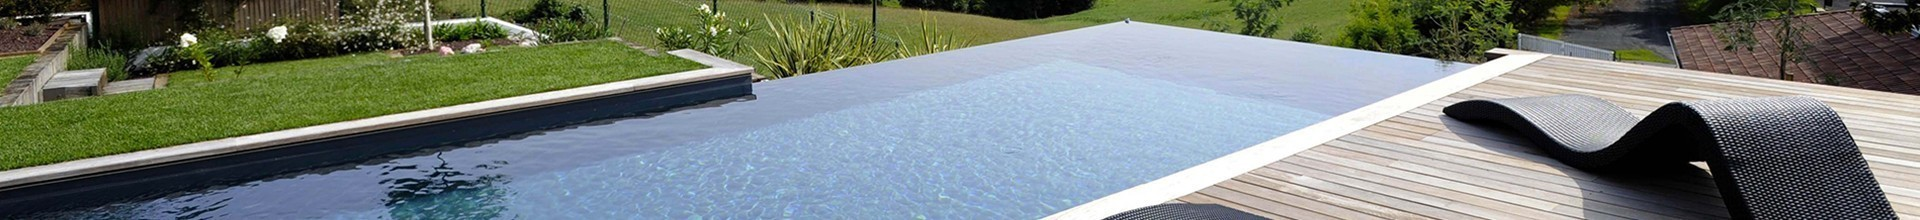 Direct usine, piscine coque prix Jura